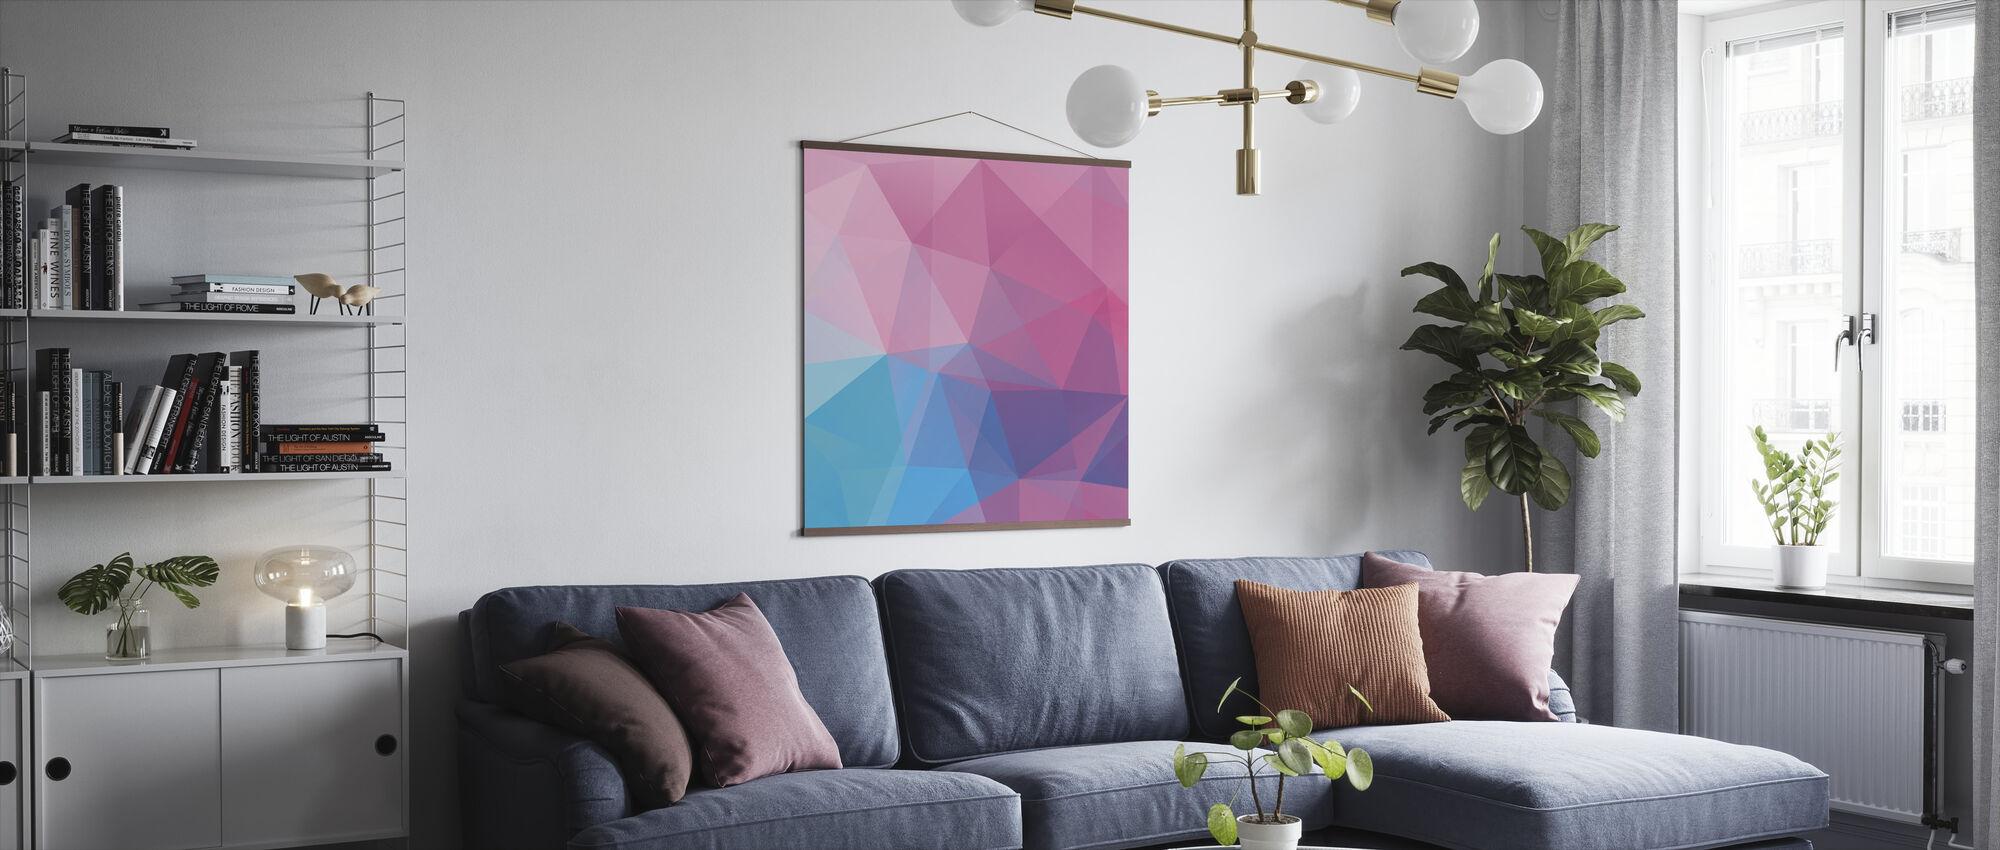 Polygonale pasteller - Plakat - Stue